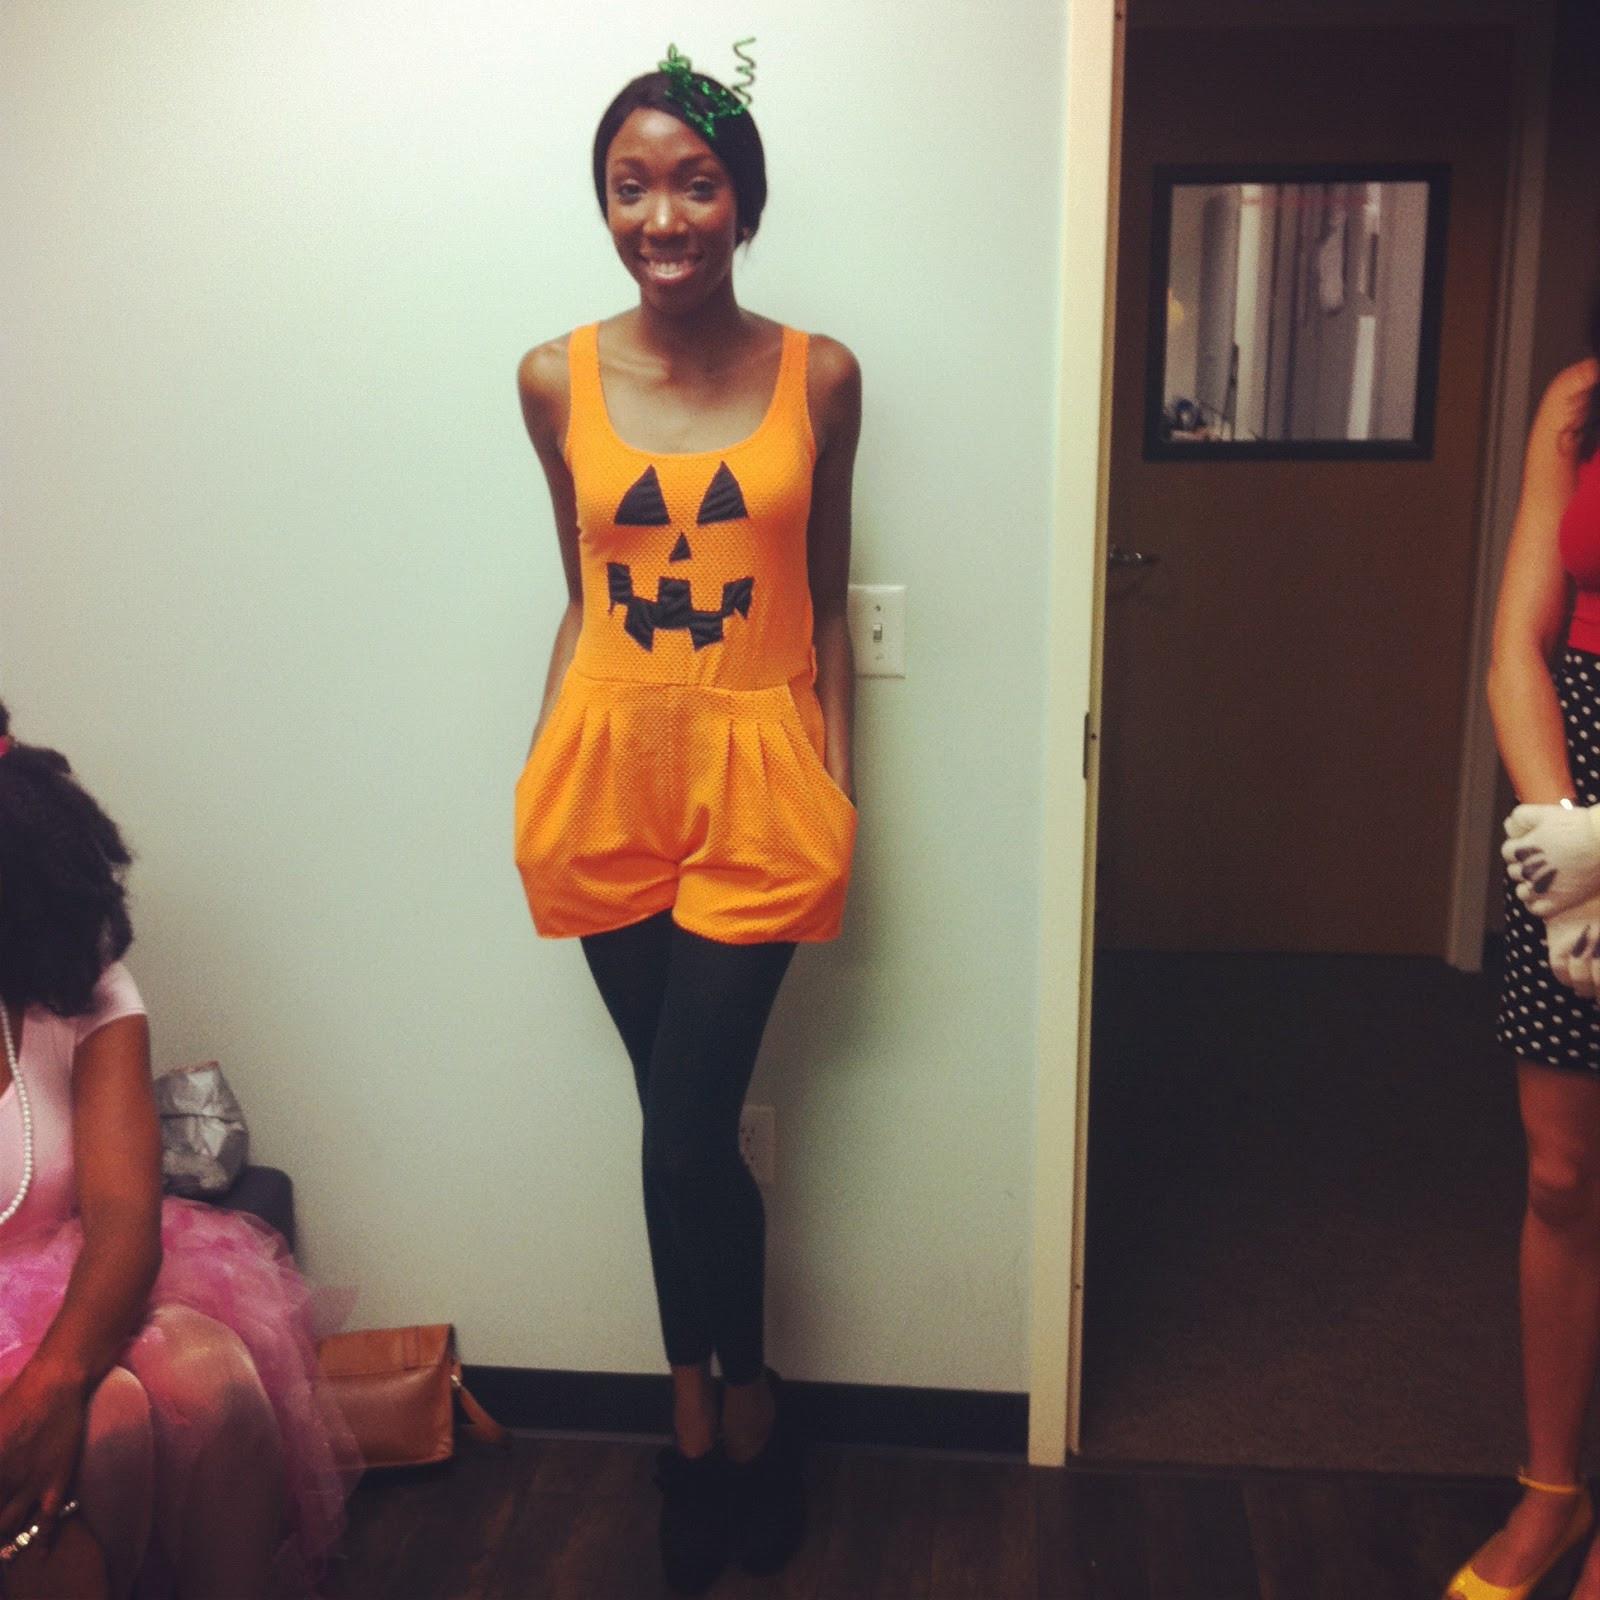 Pumpkin Costume DIY  5 DIY Halloween Costume Ideas Under 5$